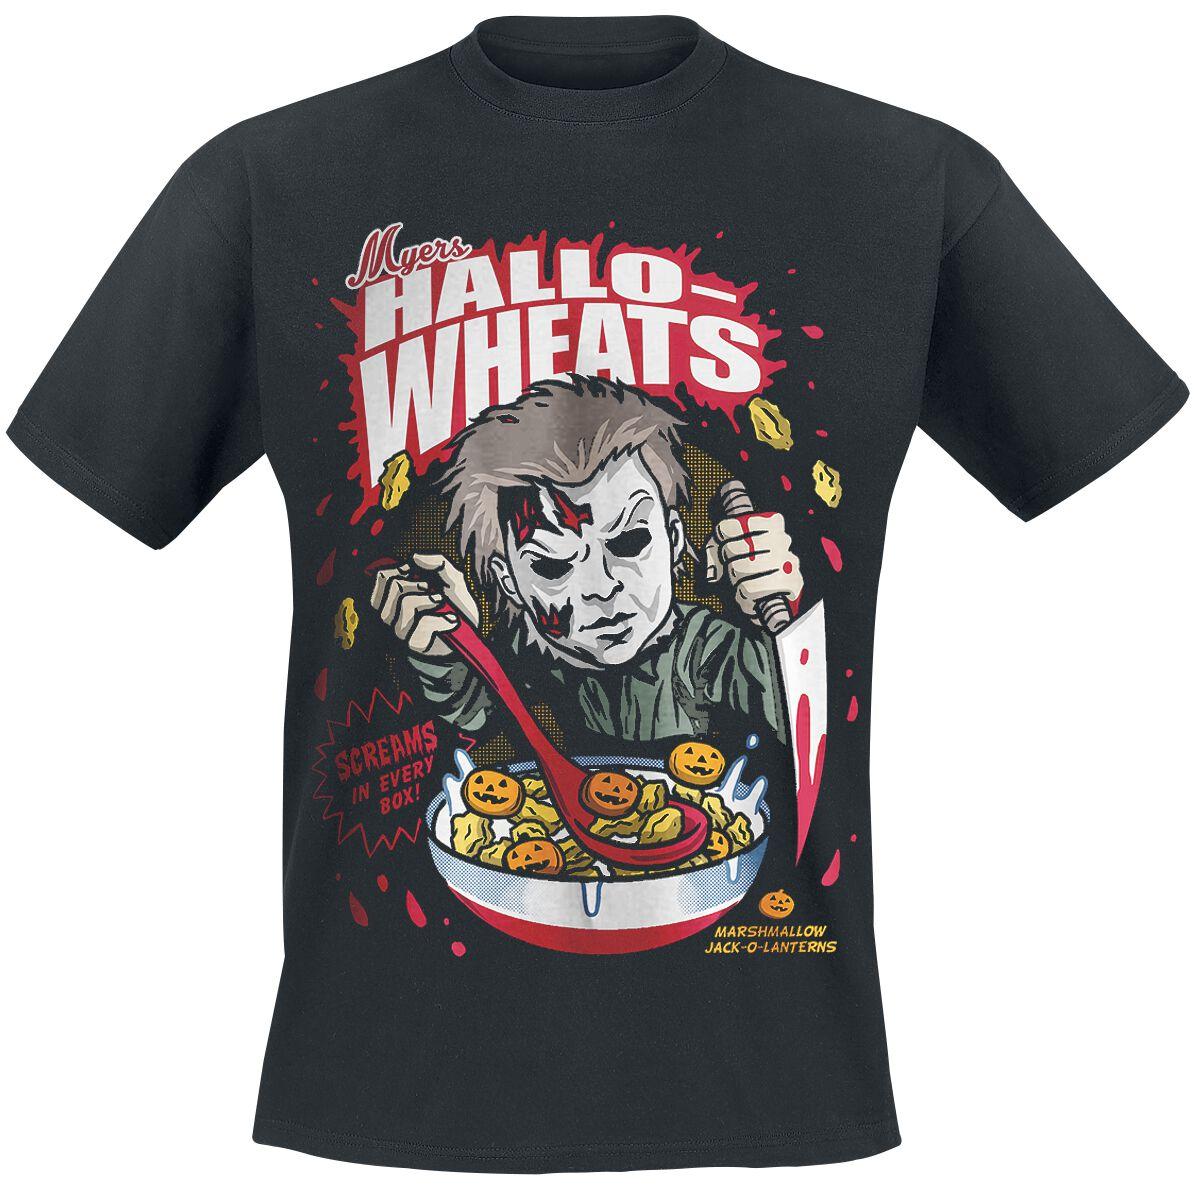 Image of   Halloween Michael Myers - Hallo-Wheats Cereal T-Shirt sort